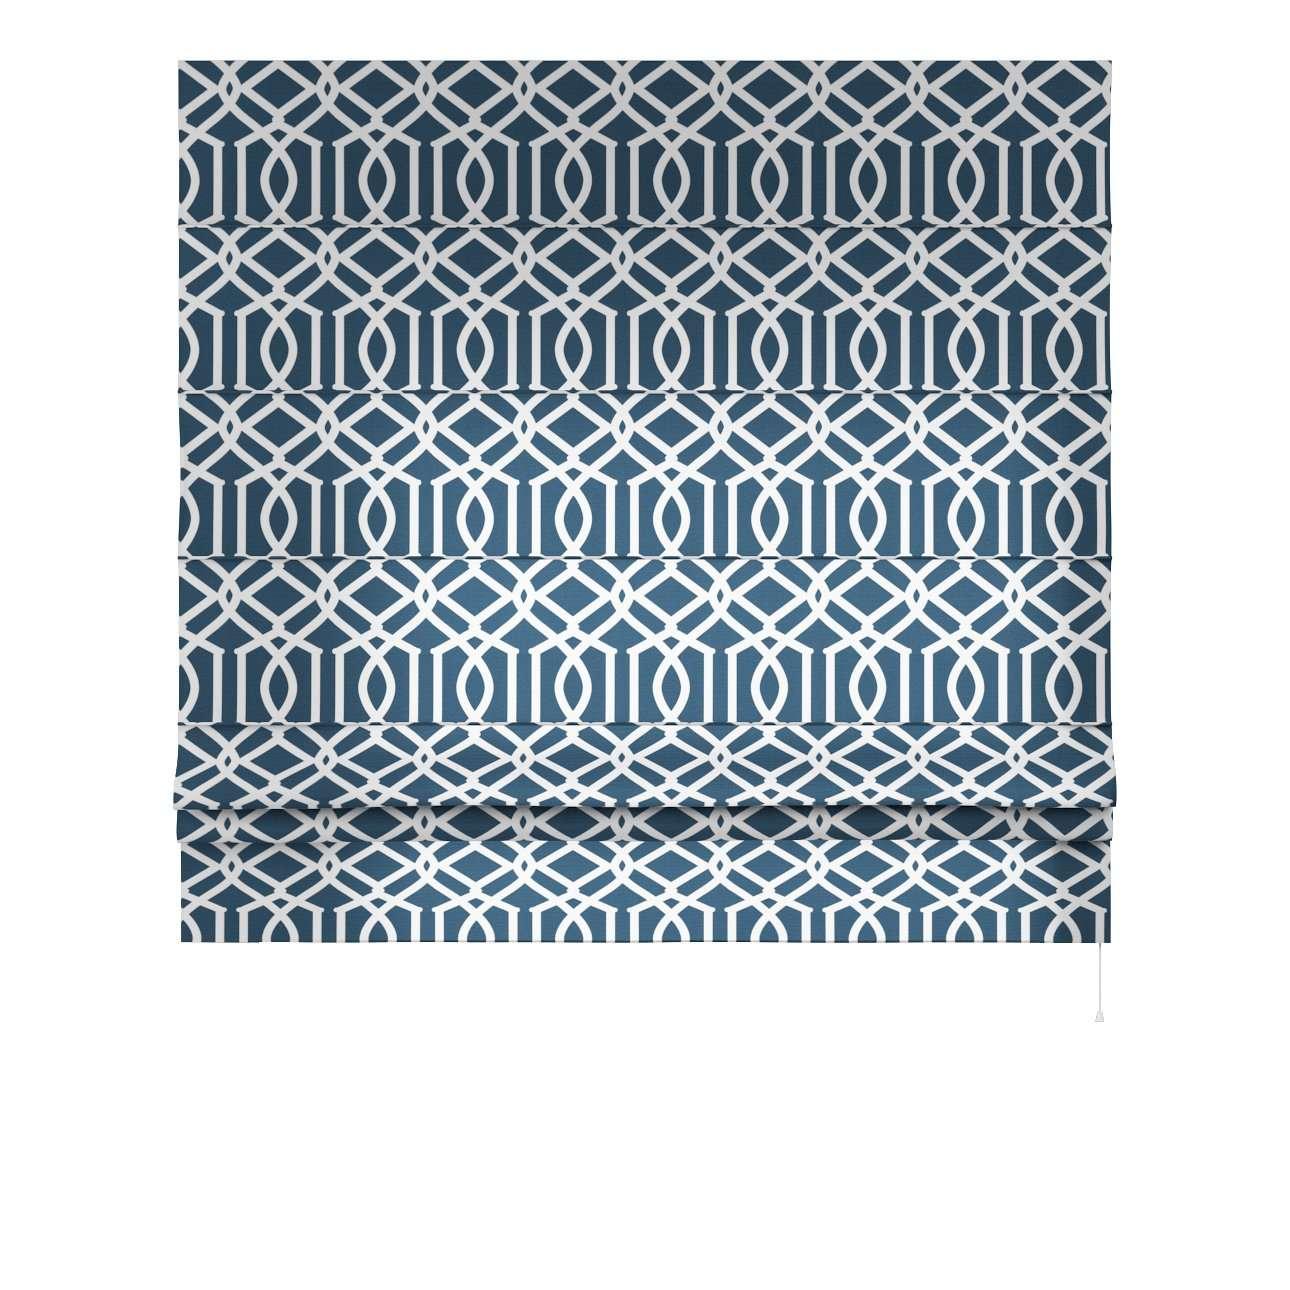 Rímska roleta Padva 80 x 170 cm V kolekcii Comics, tkanina: 135-10